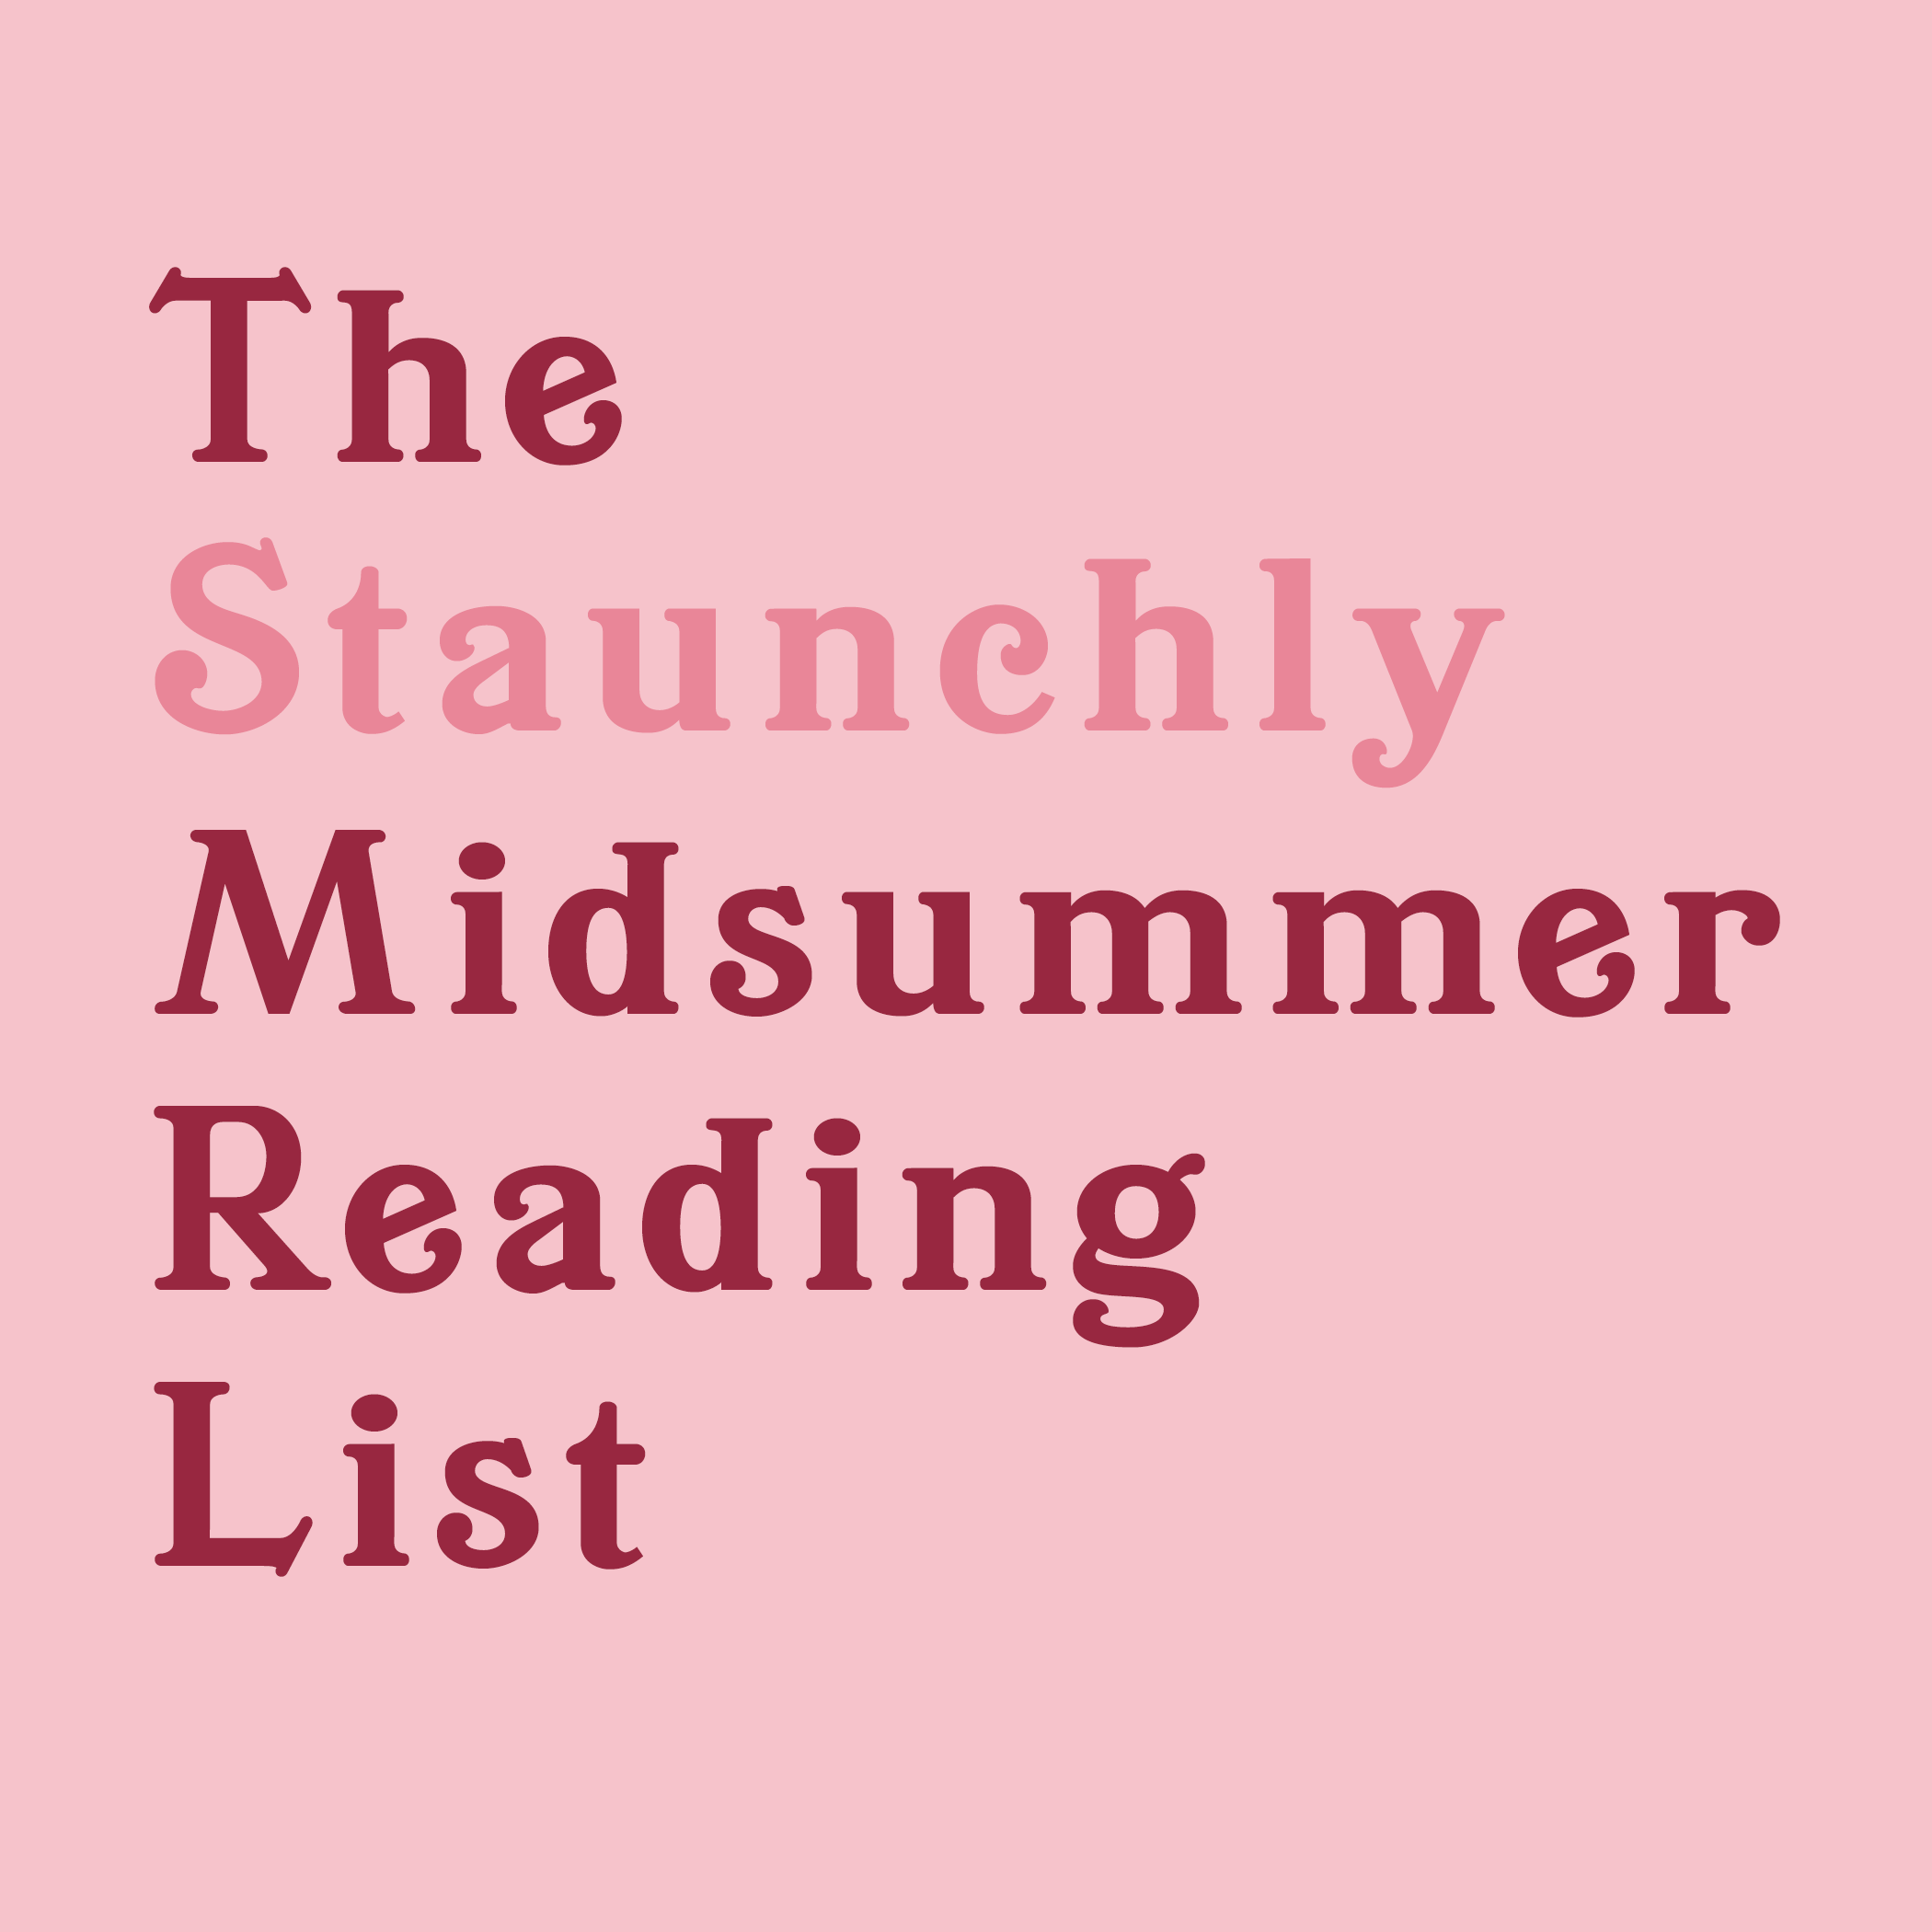 Staunchly Midsummer Reading List v 5 copy.png